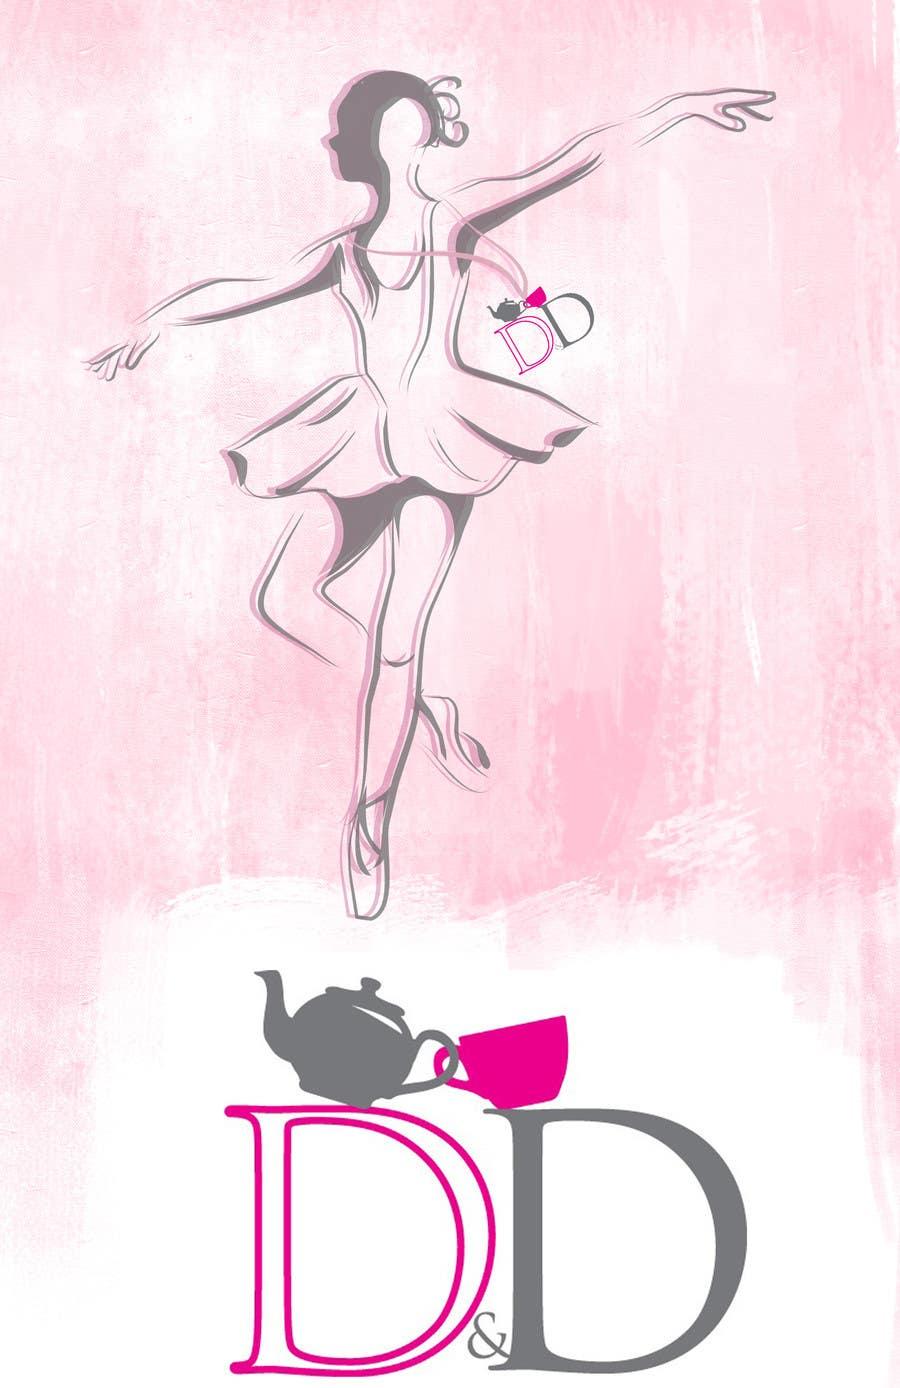 #16 for Silhouette illustrations by eduardobravo